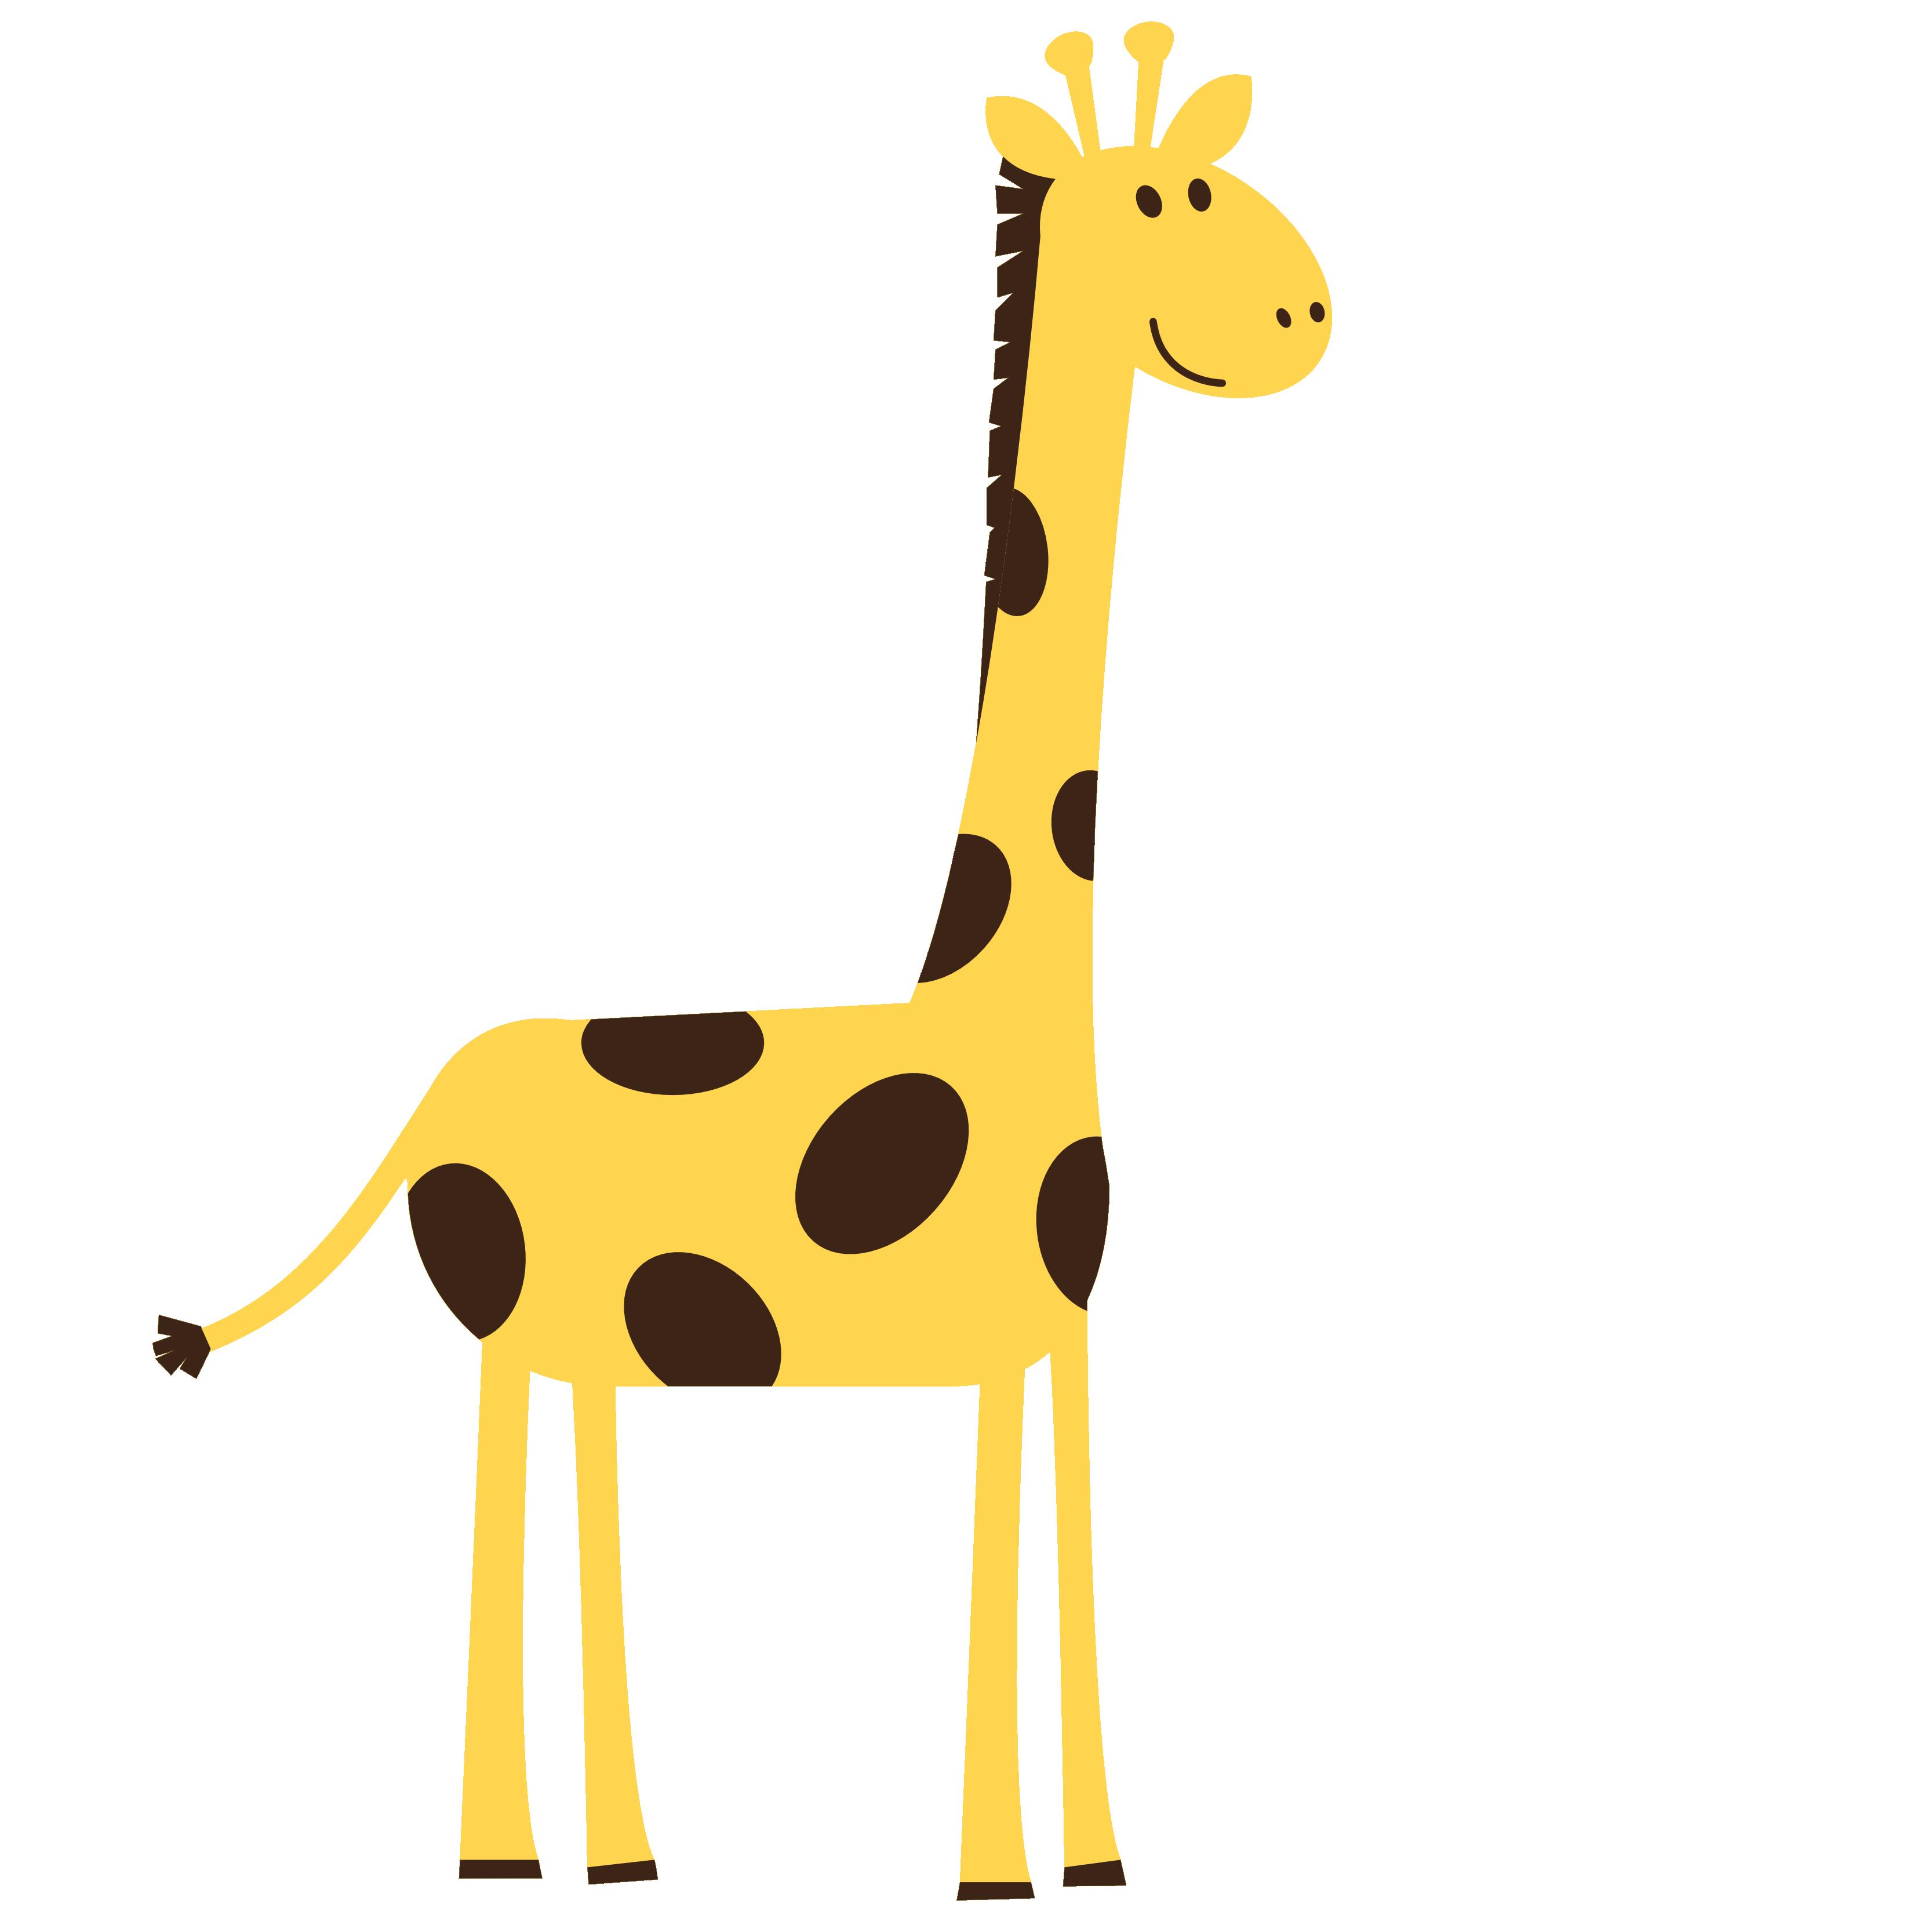 17 giraffe clipart kids birthday branding pinterest giraffe rh pinterest com giraffe clipart black and white giraffe clip art pictures